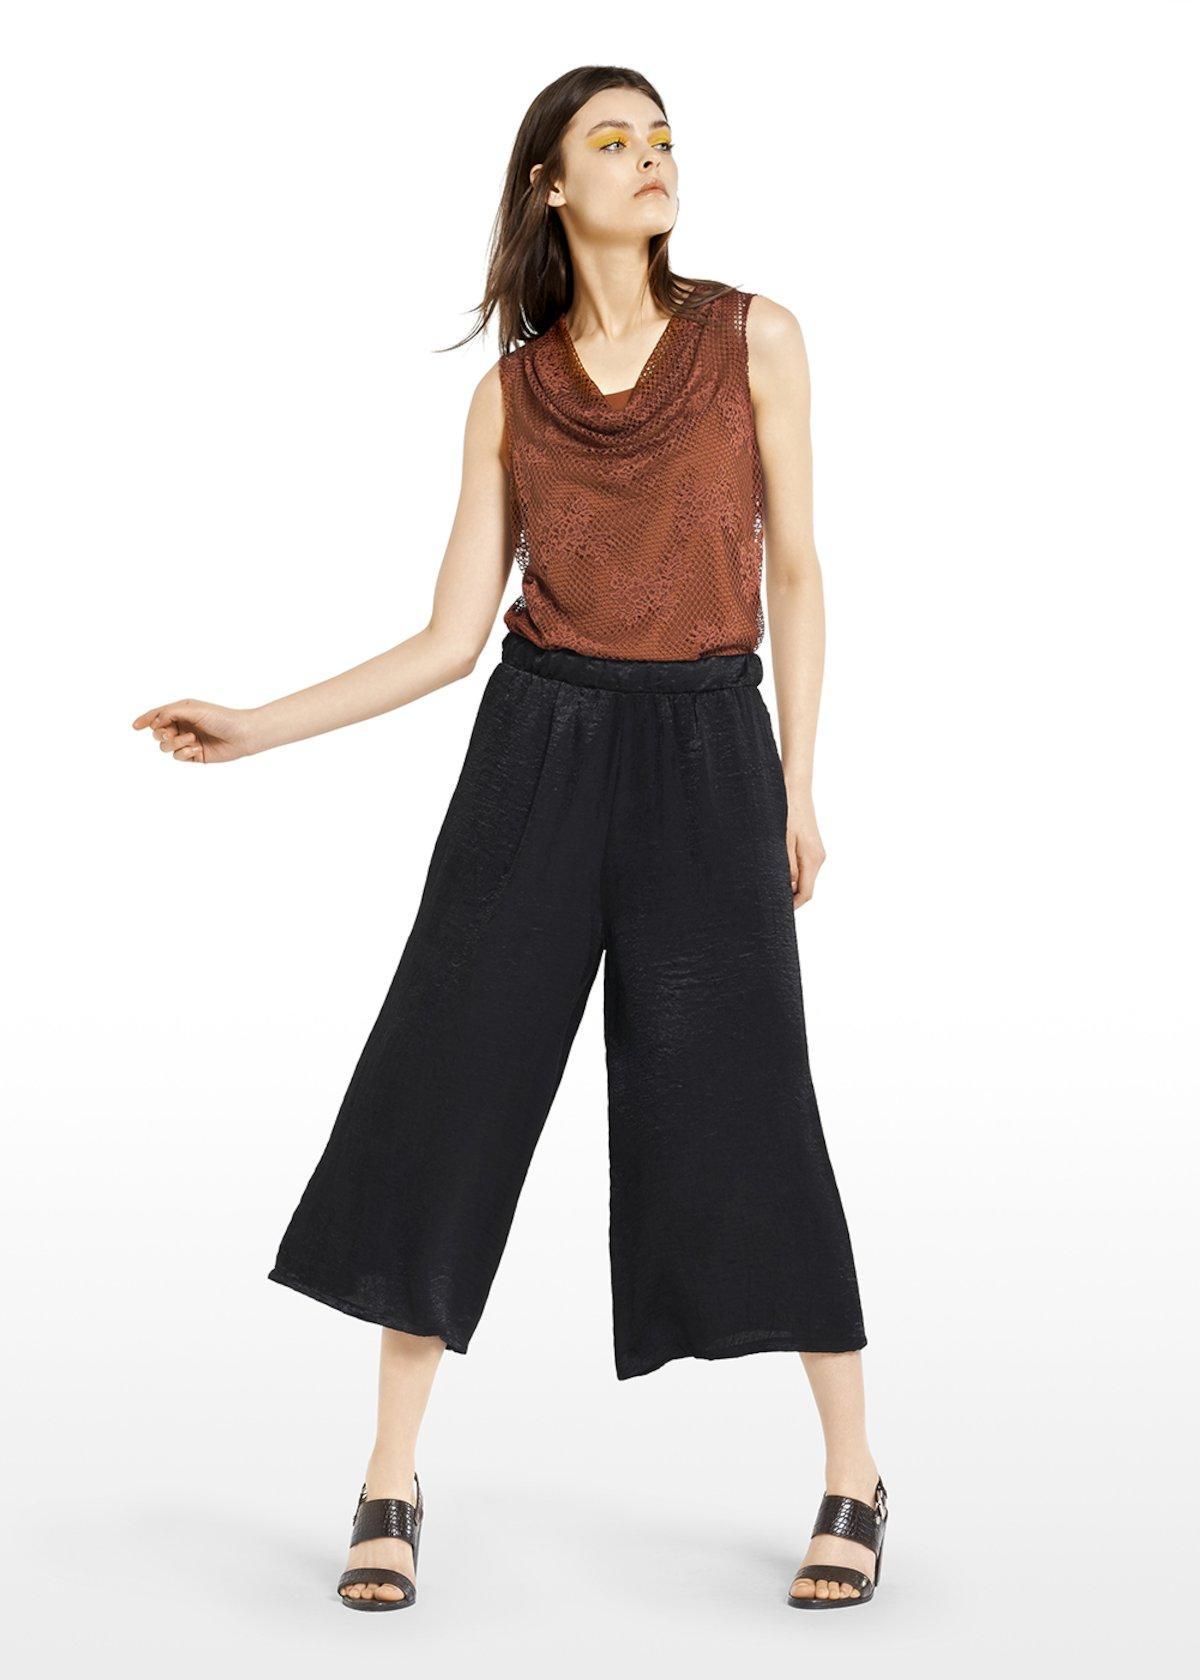 Megan model trousers satin effect